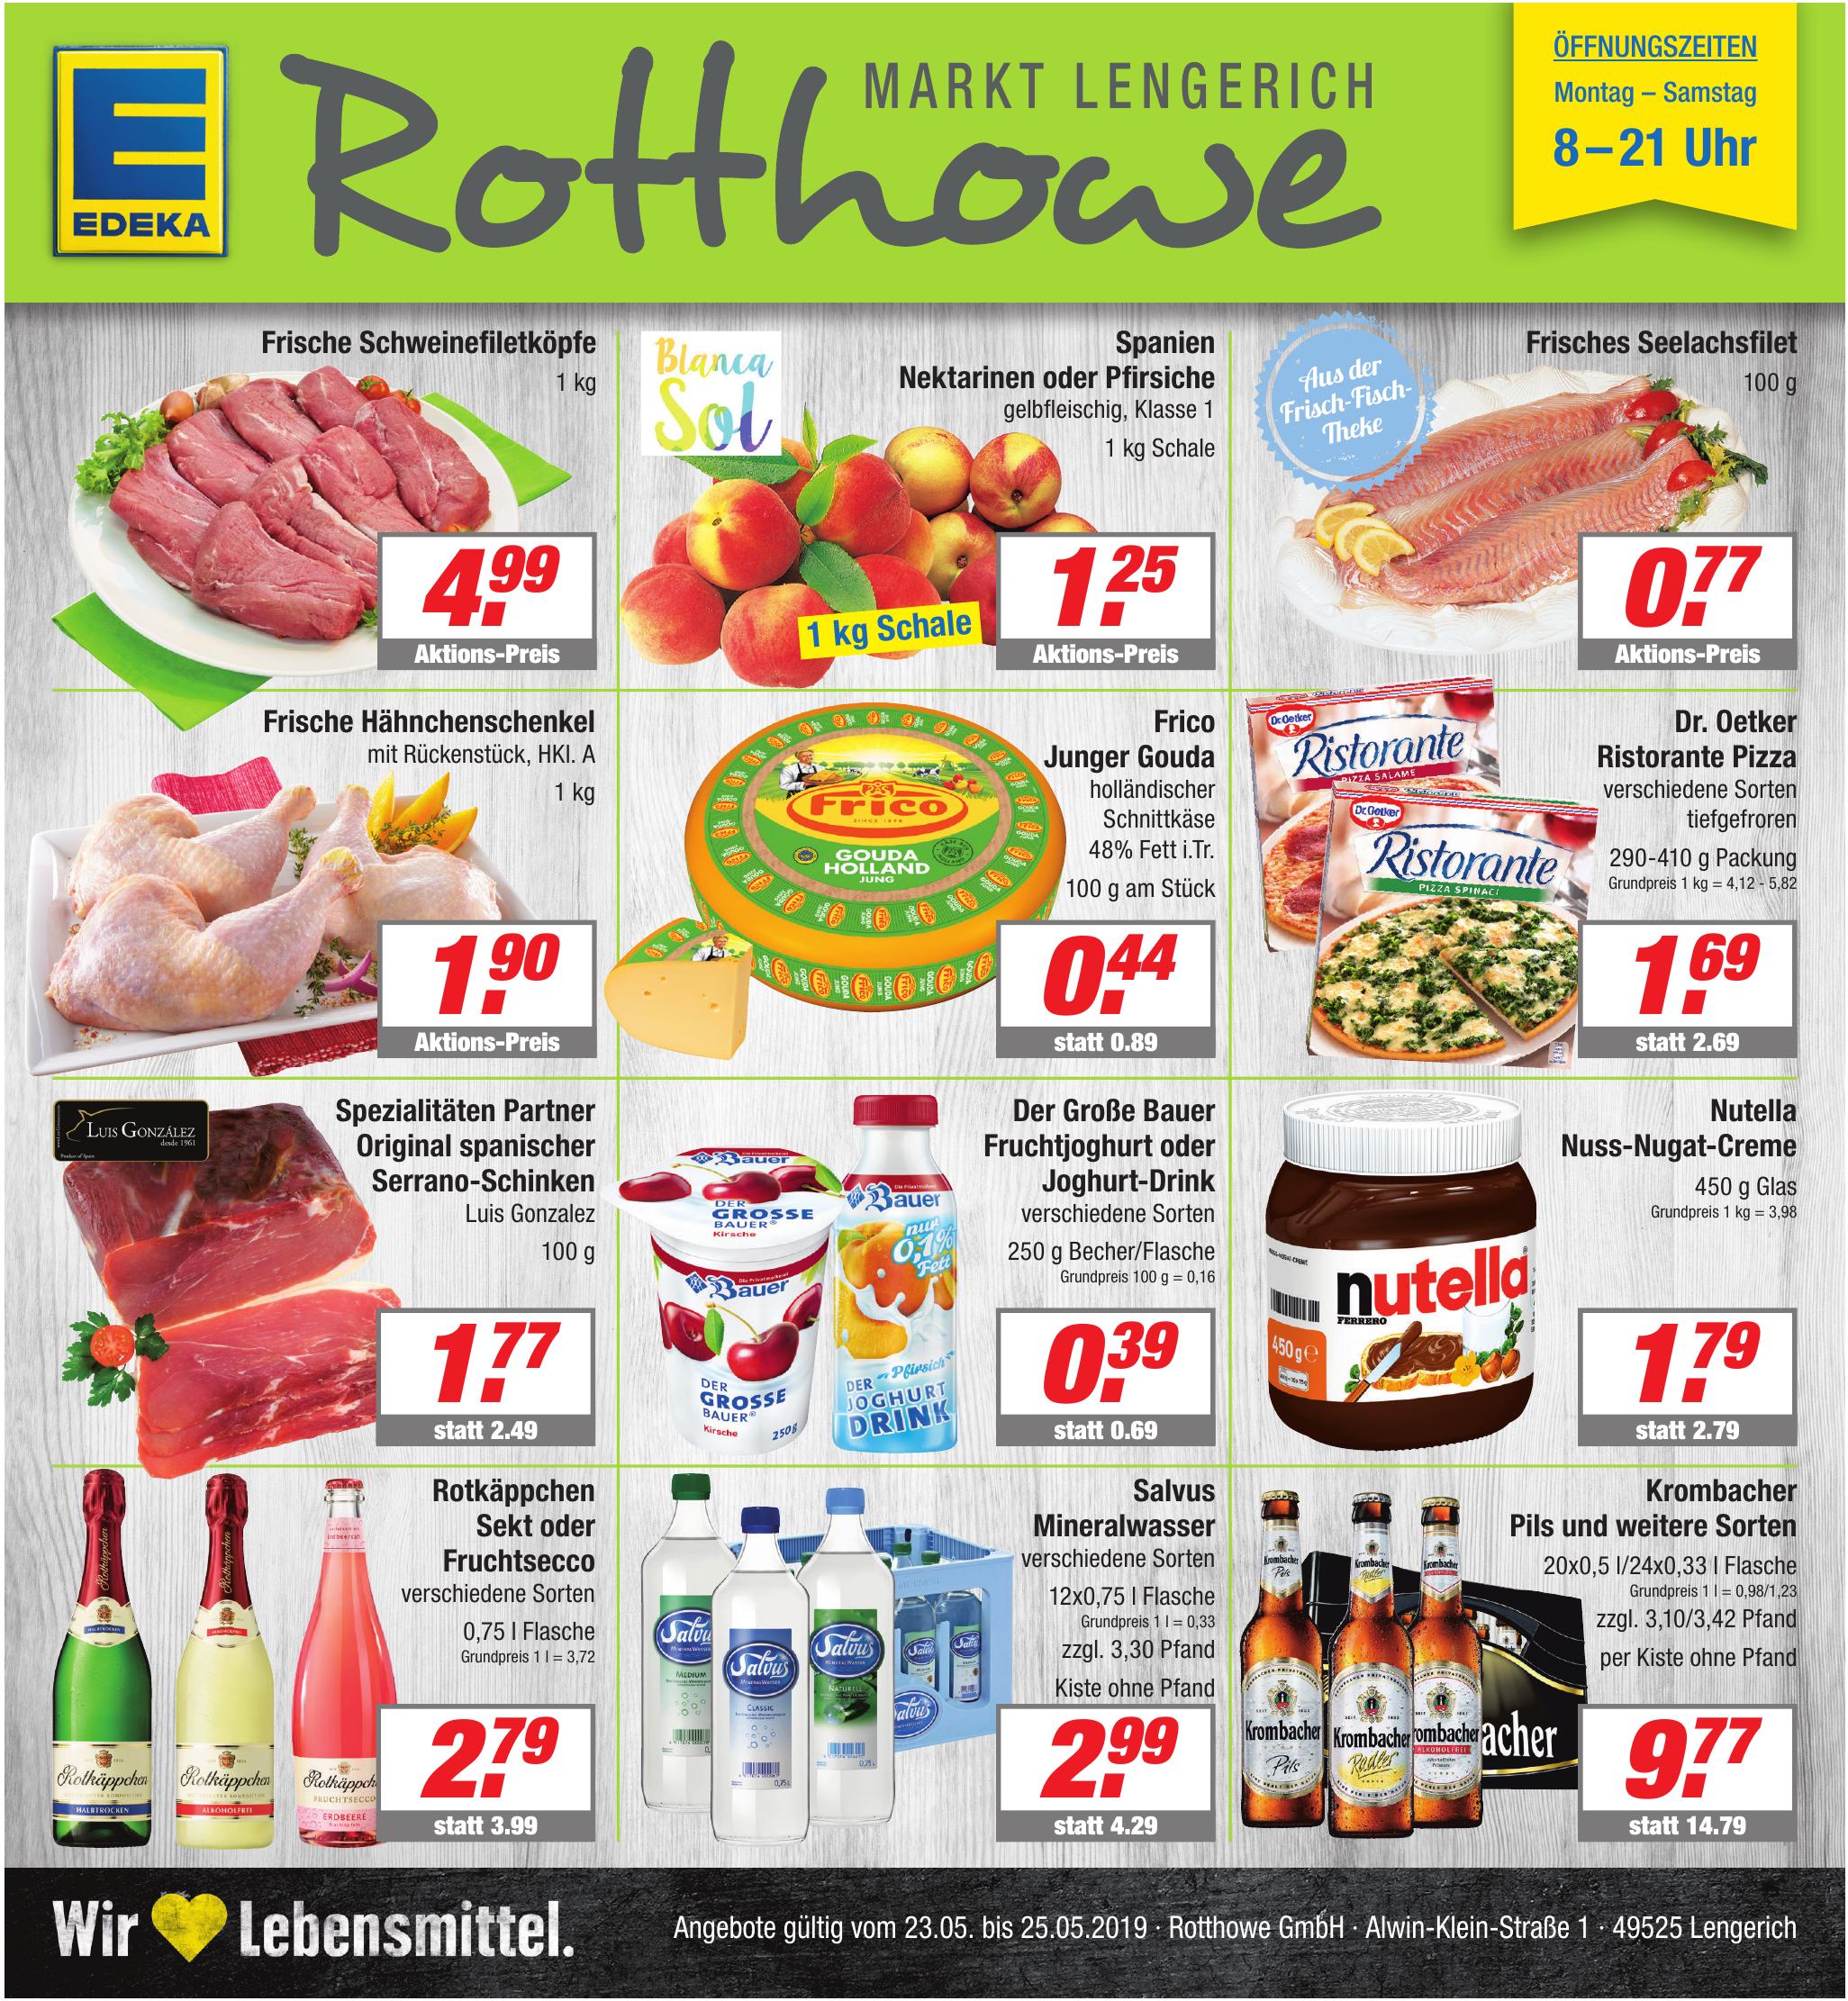 Rotthowe GmbH